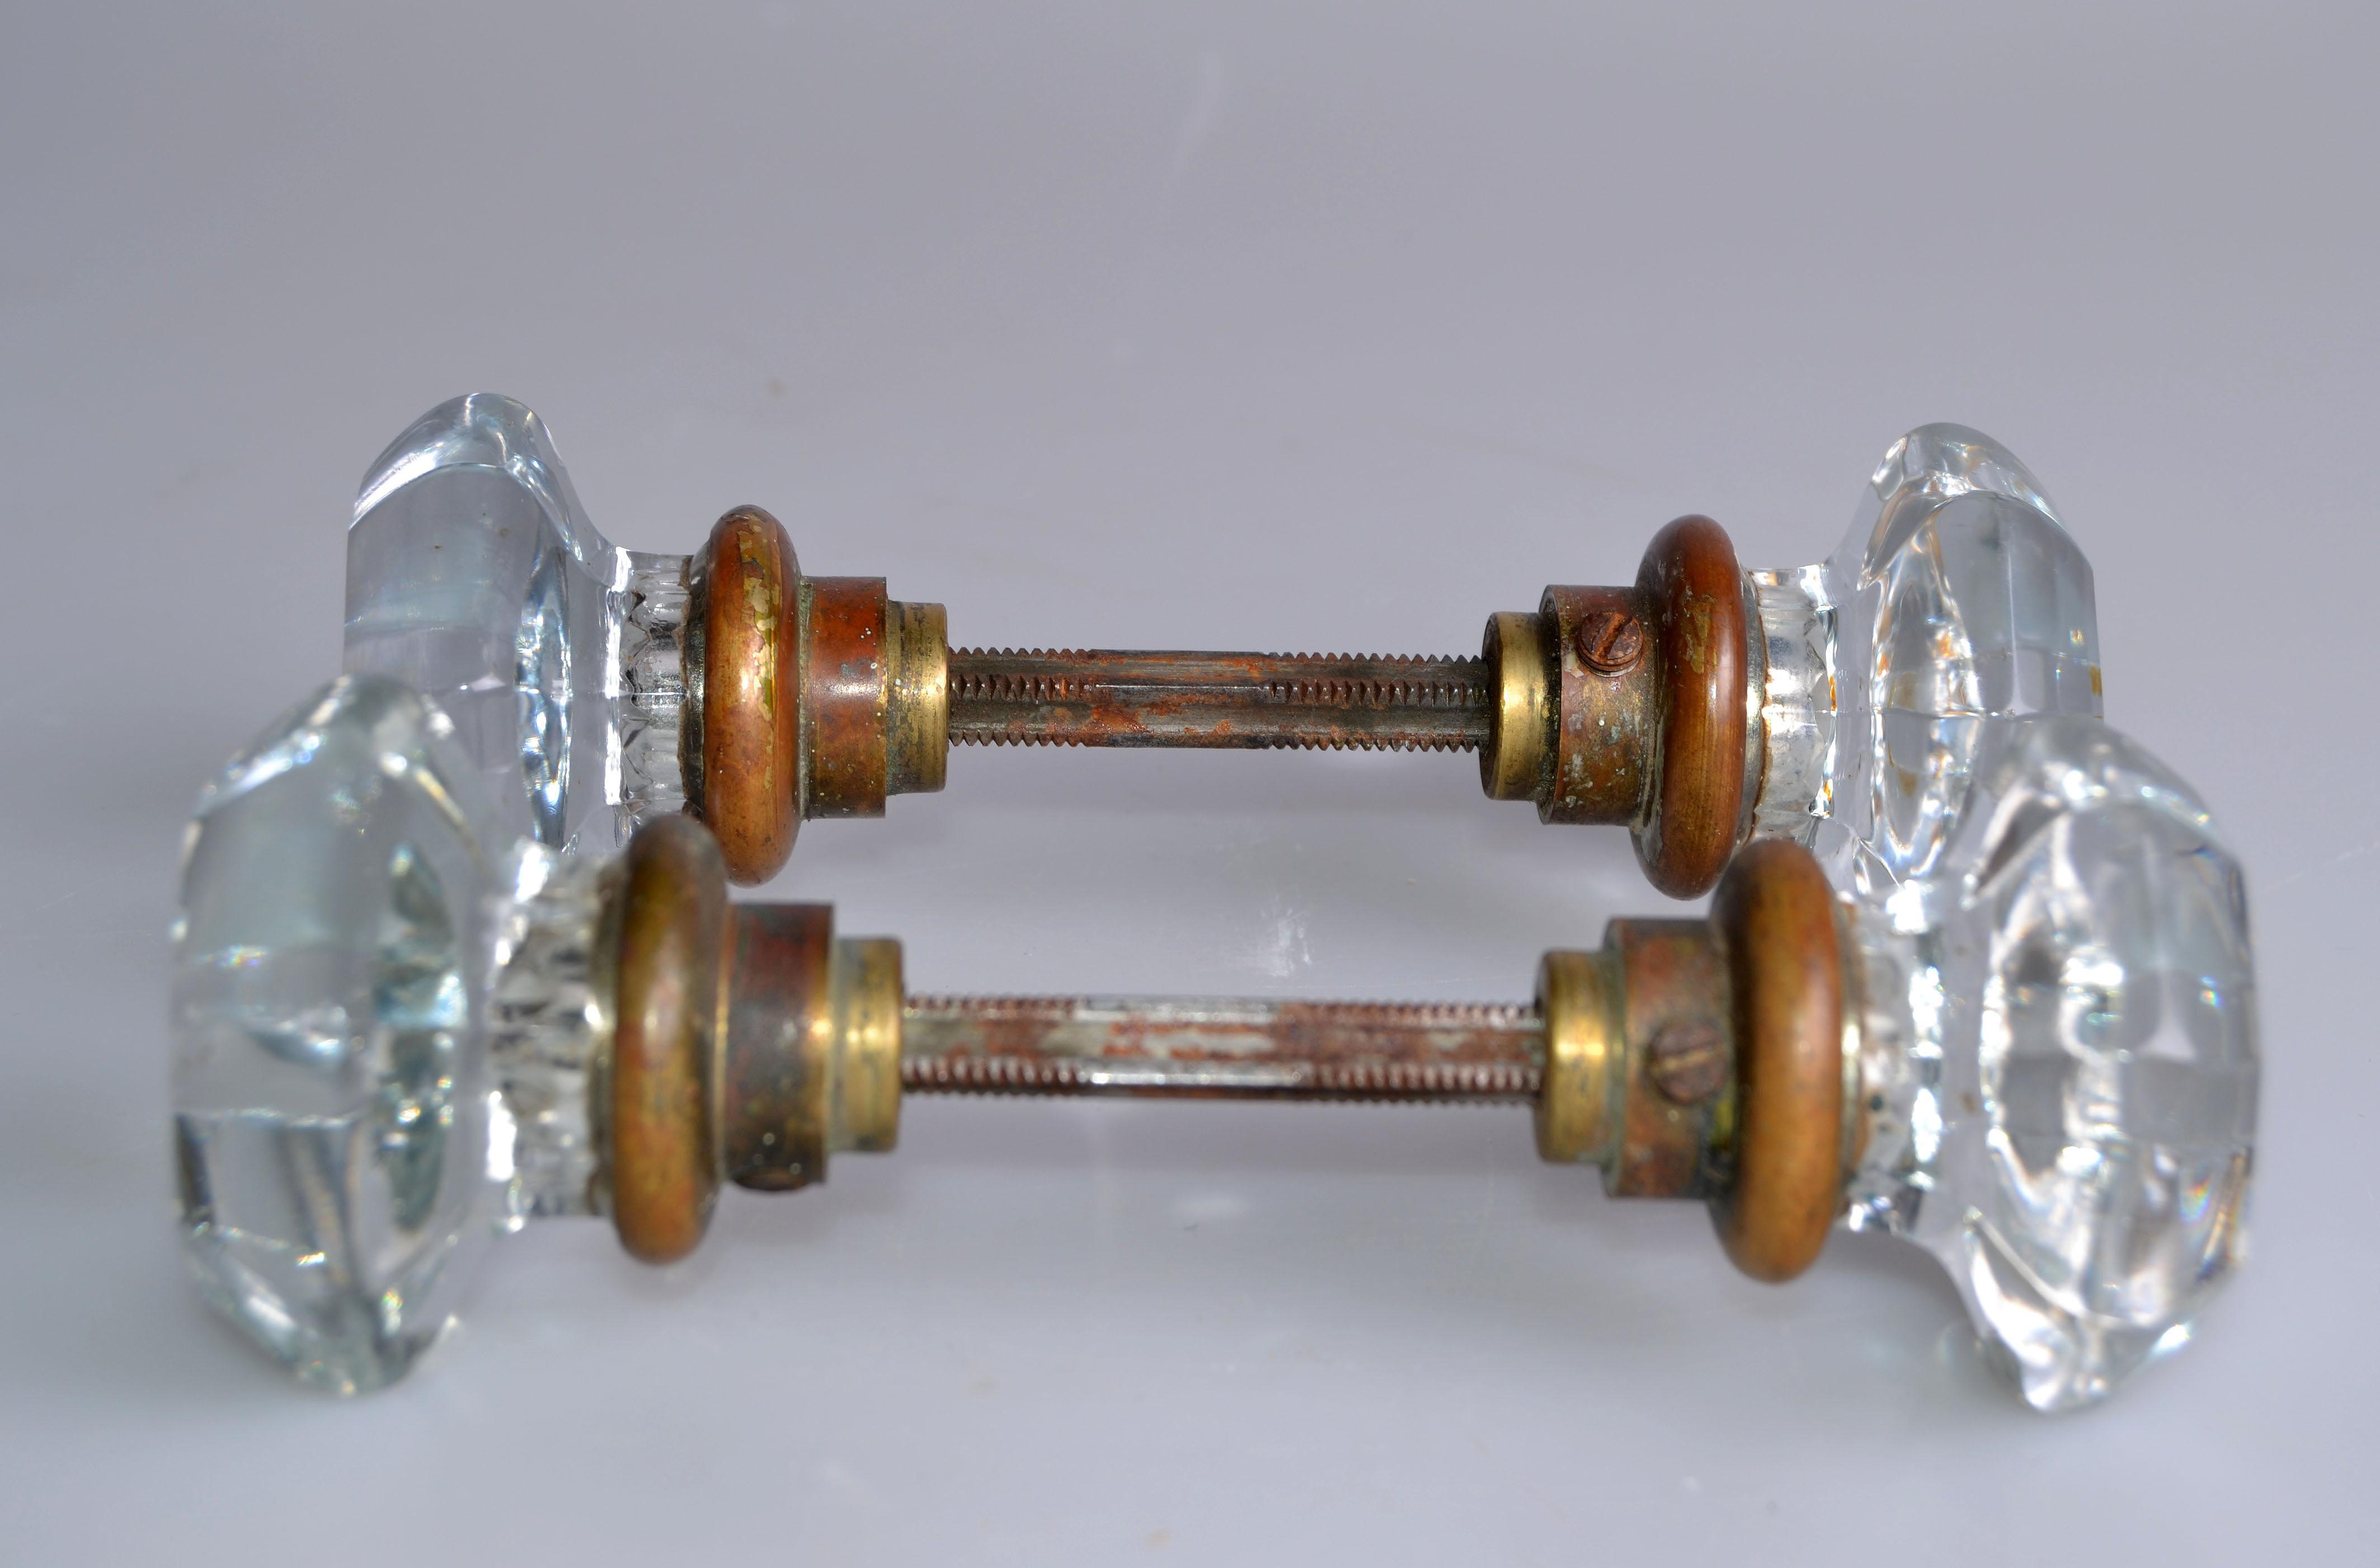 Art Deco Lucite U0026 Brass Door Knobs   A Pair   Image 4 ...